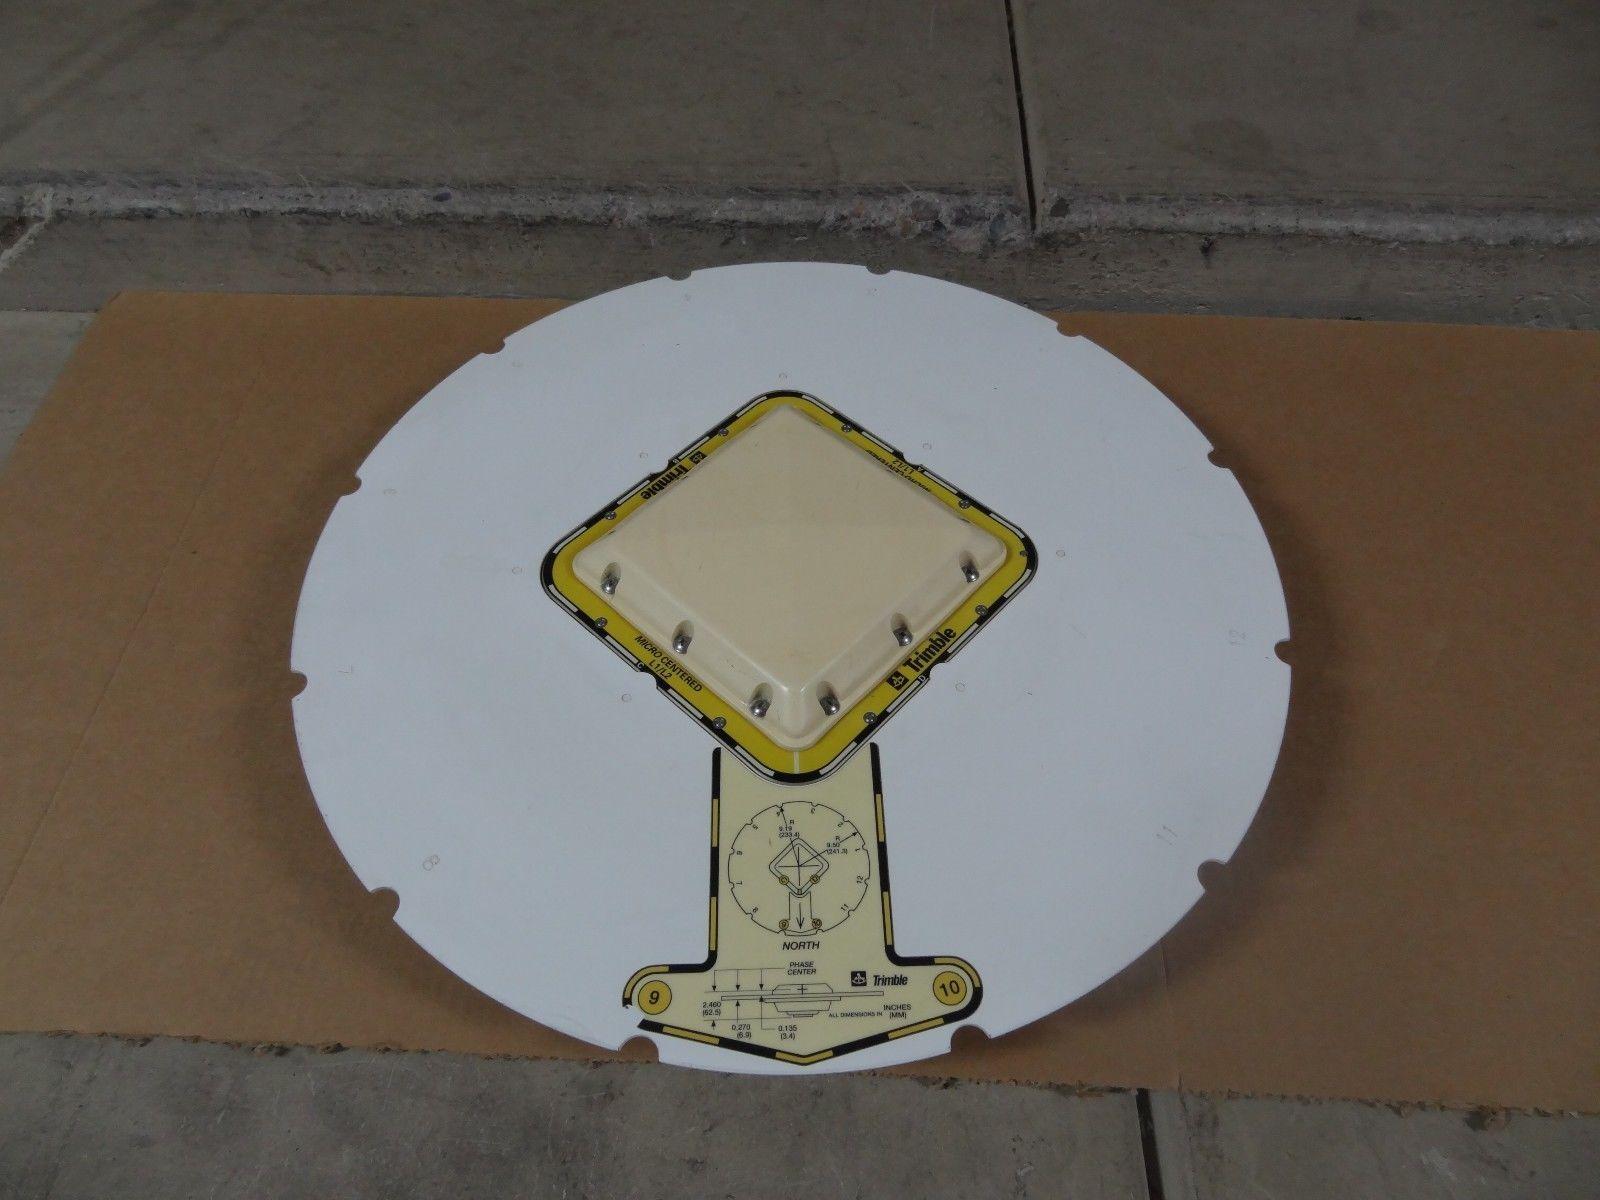 Trimble Micro Centered Geodetic L1/L2 GPS Antenna W Ground